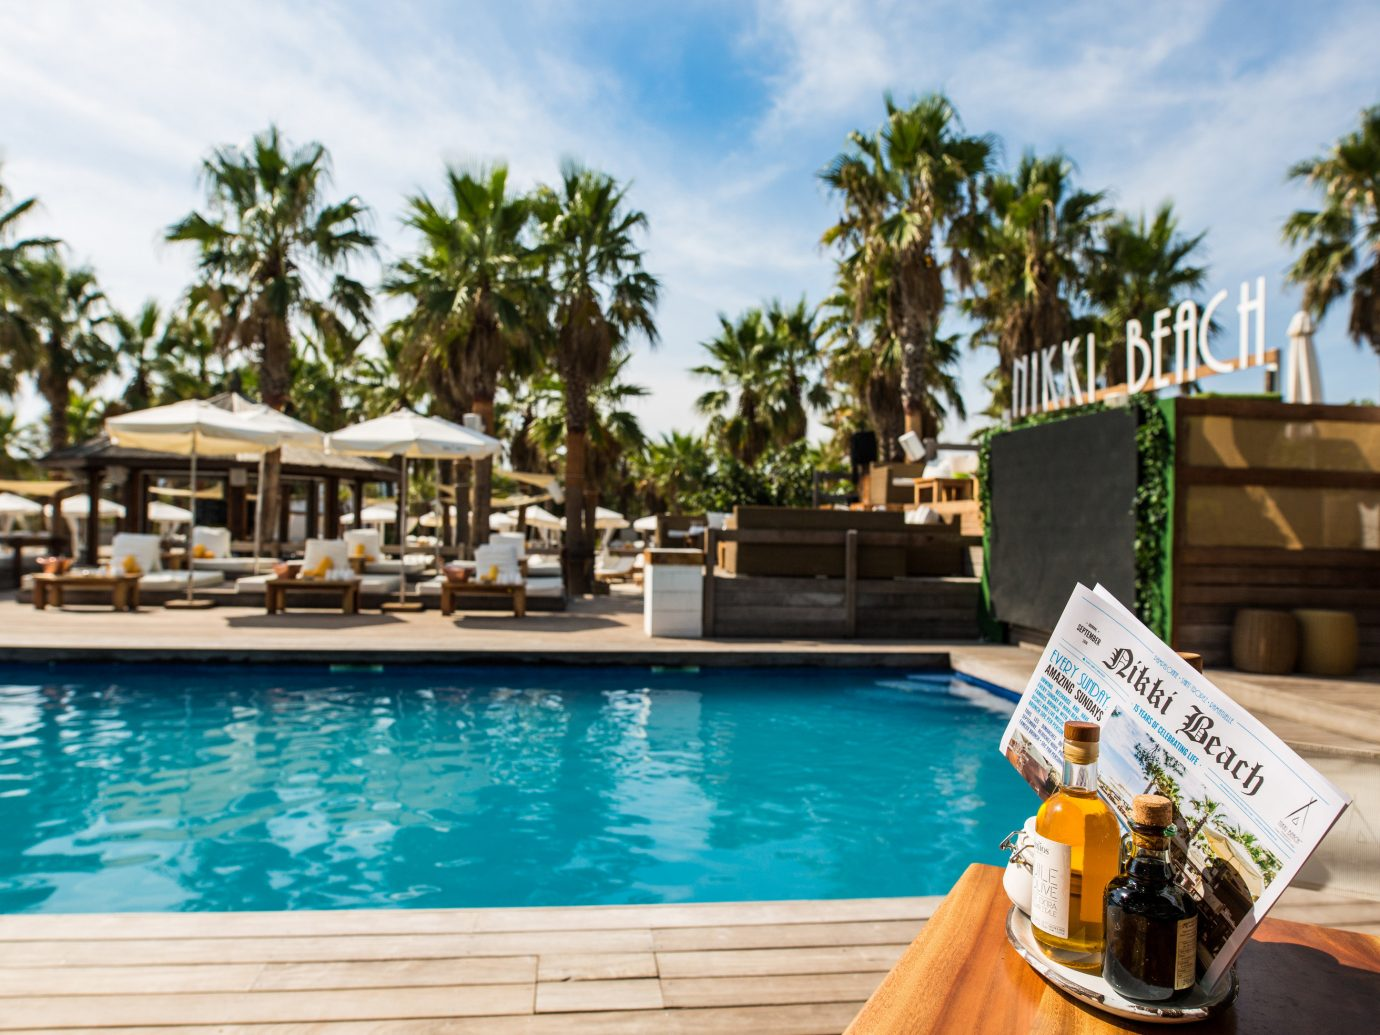 Saint-Tropez pool